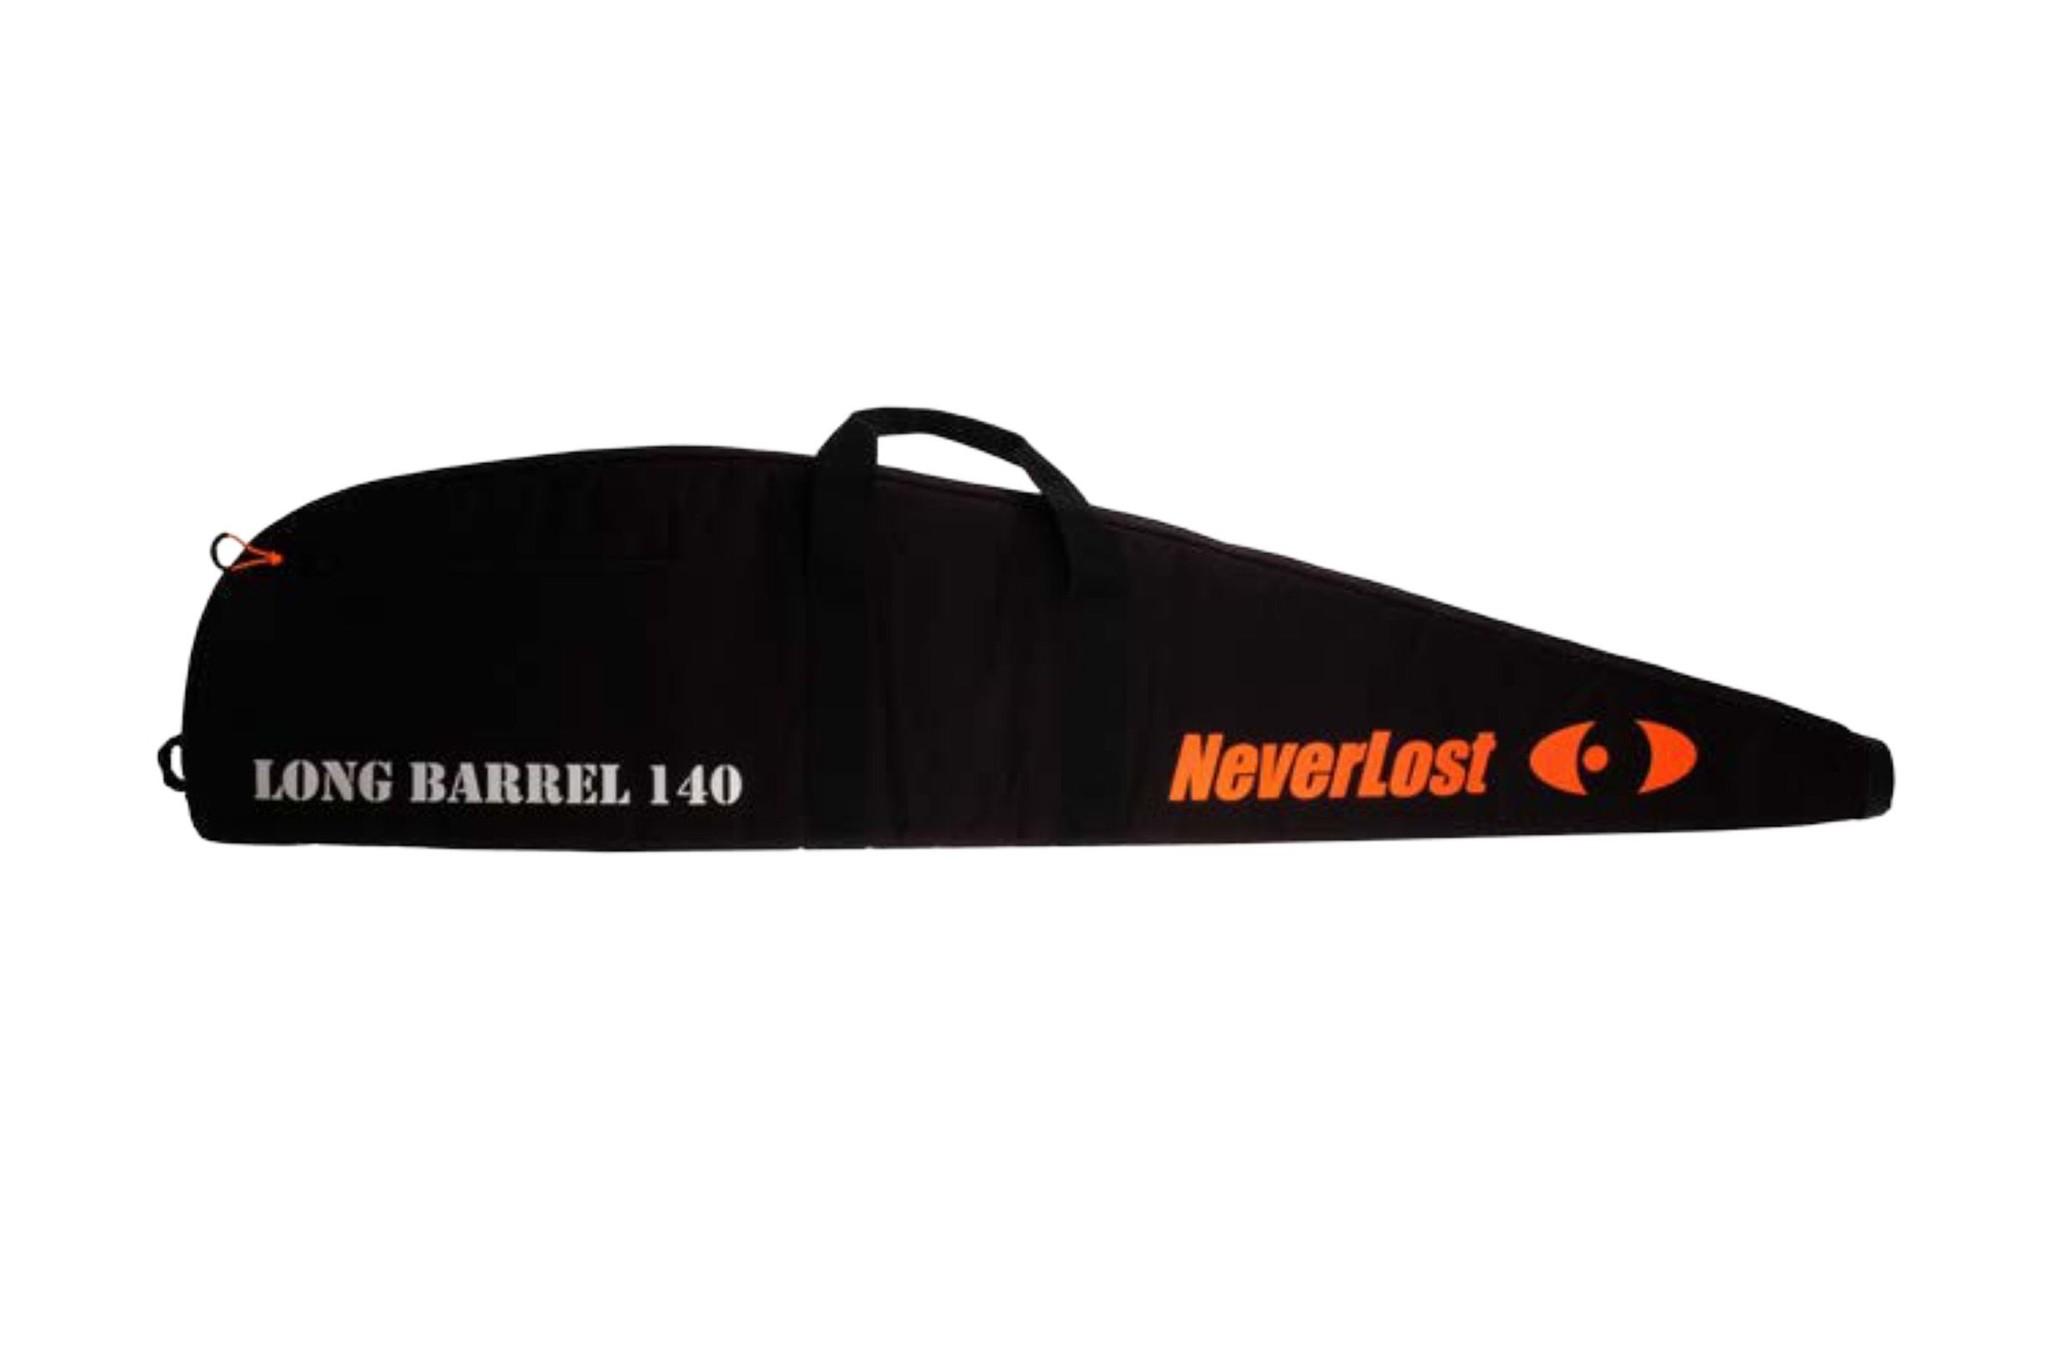 Neverlost Rifle Bag Long Barrel 140 cm - BK